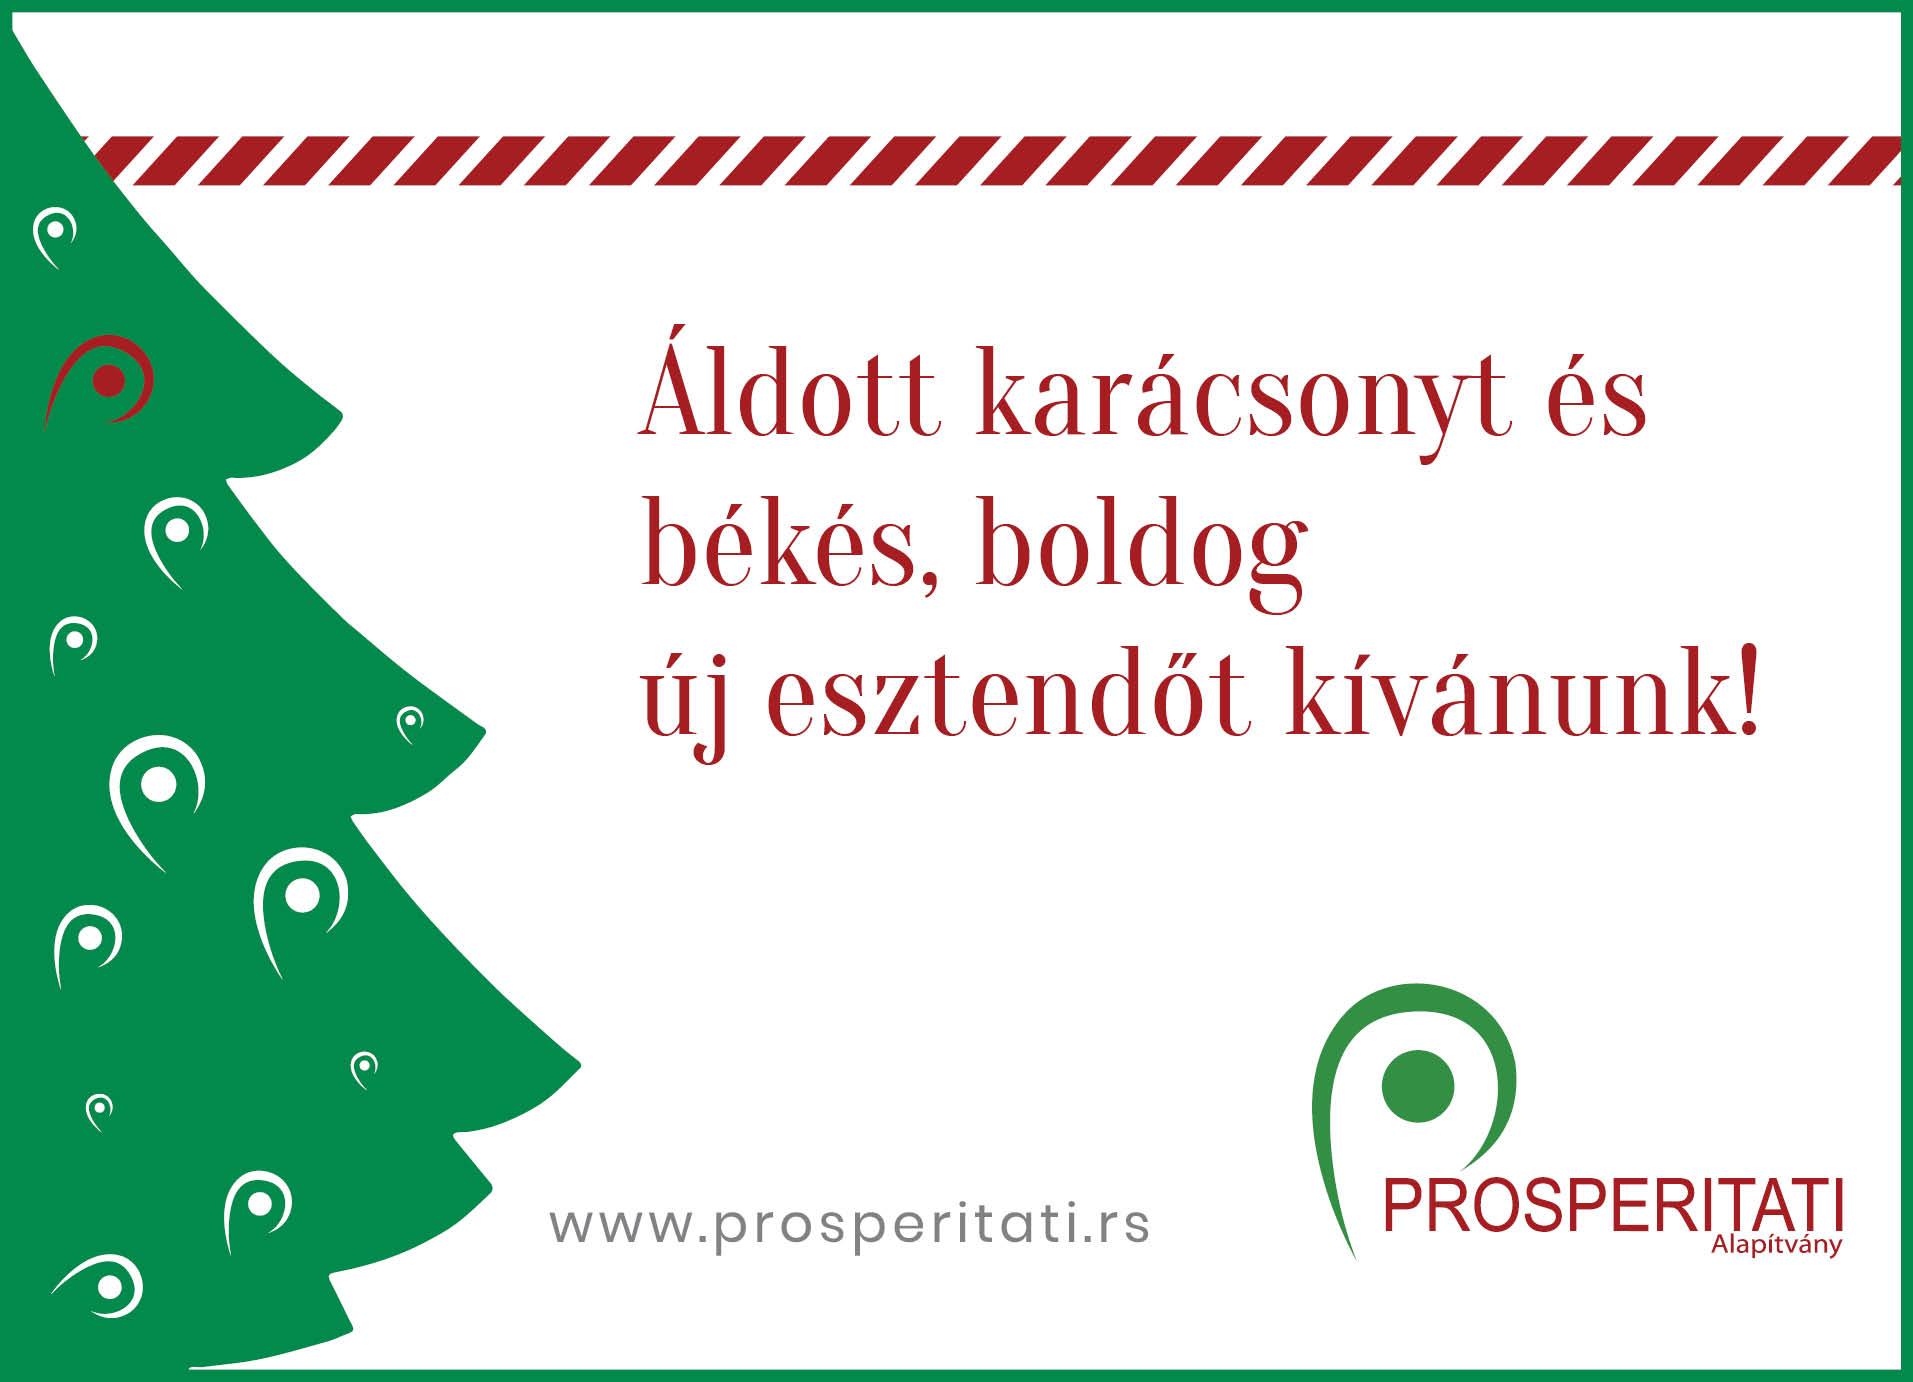 prosperitati_magyarszo_270x195mm_2019_01.jpg